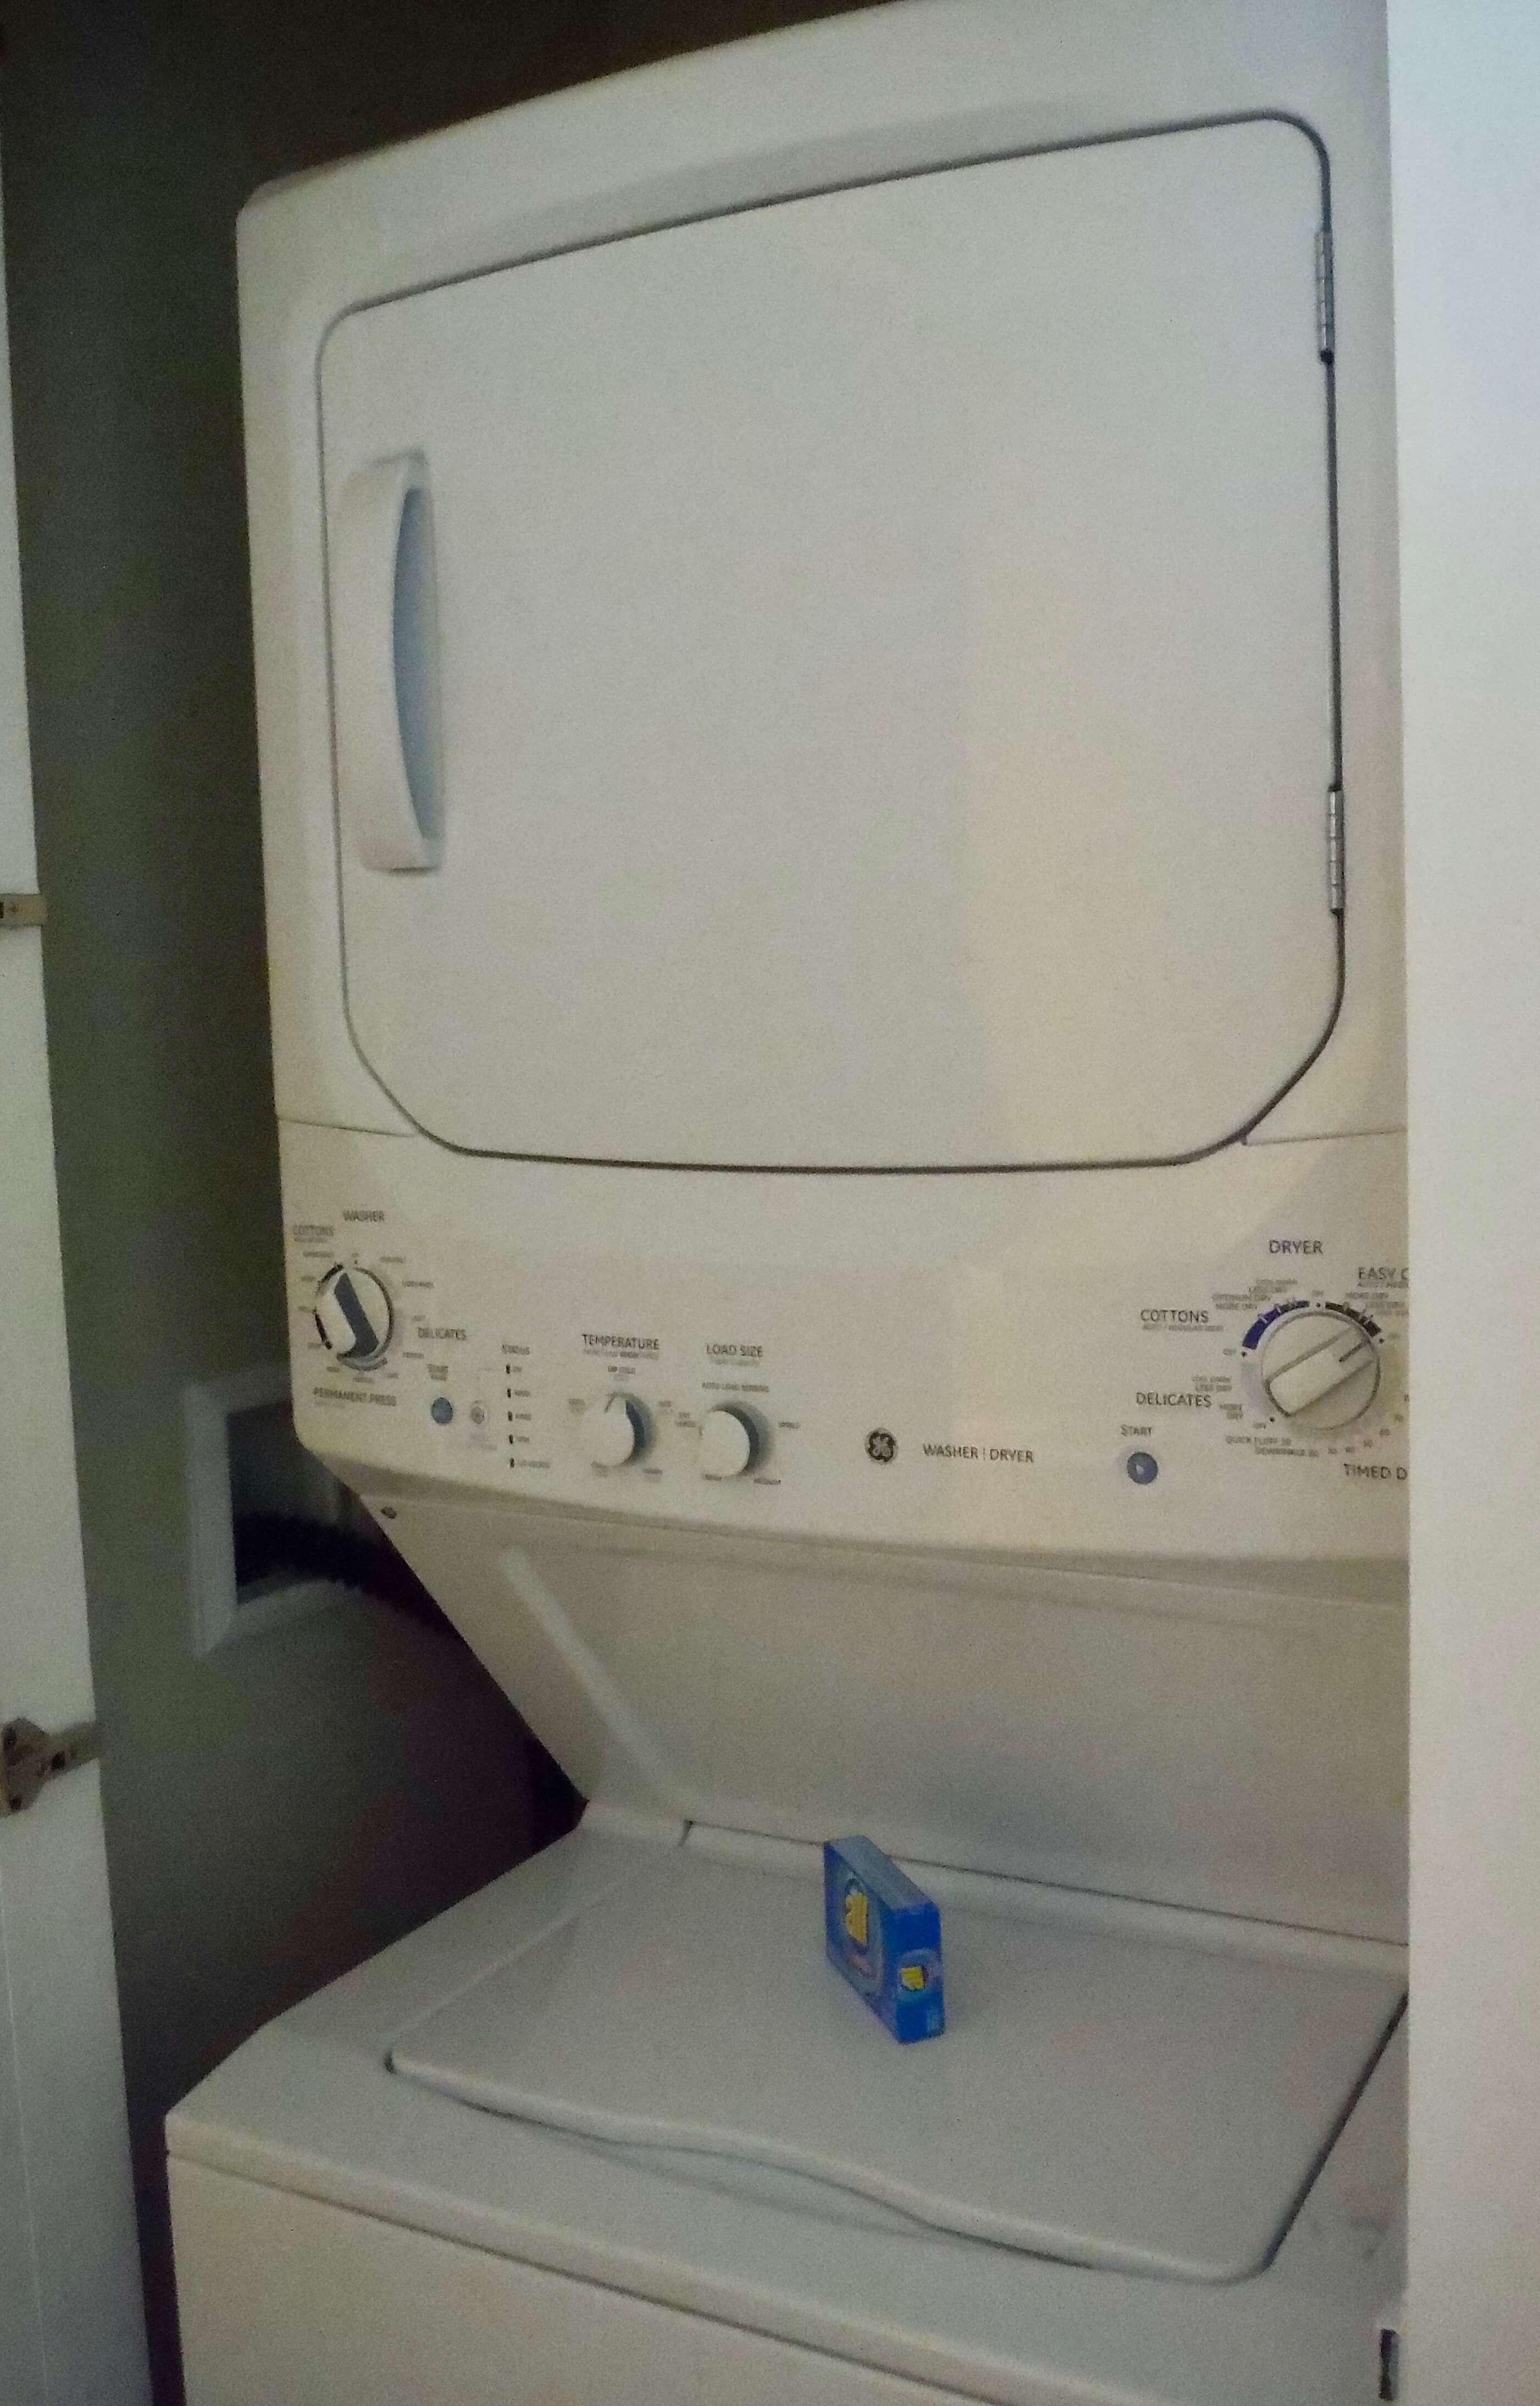 DVC GFV washer dryer